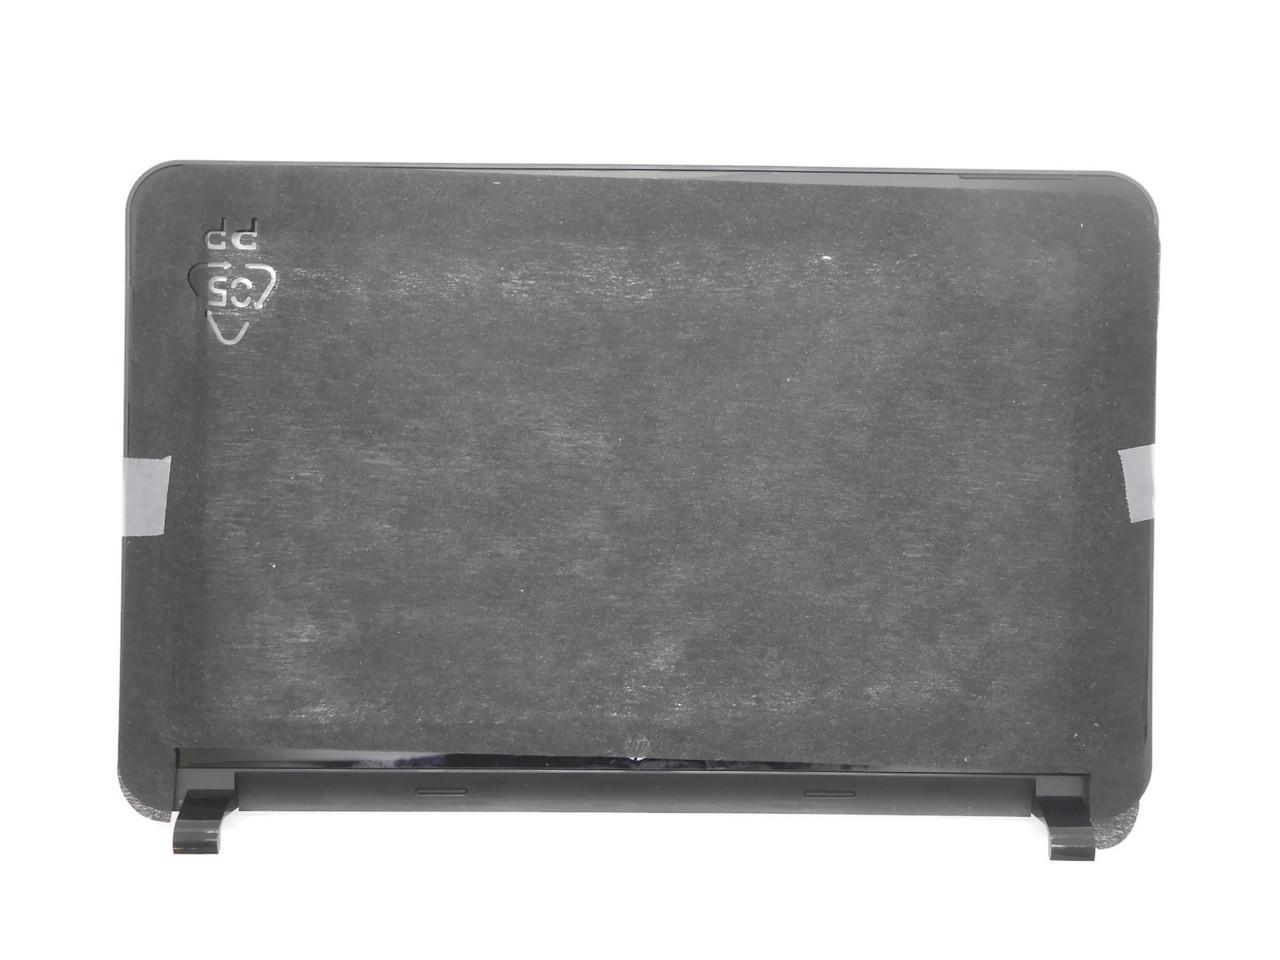 HP MINI 210-1000 NOTEBOOK WINDOWS 7 64BIT DRIVER